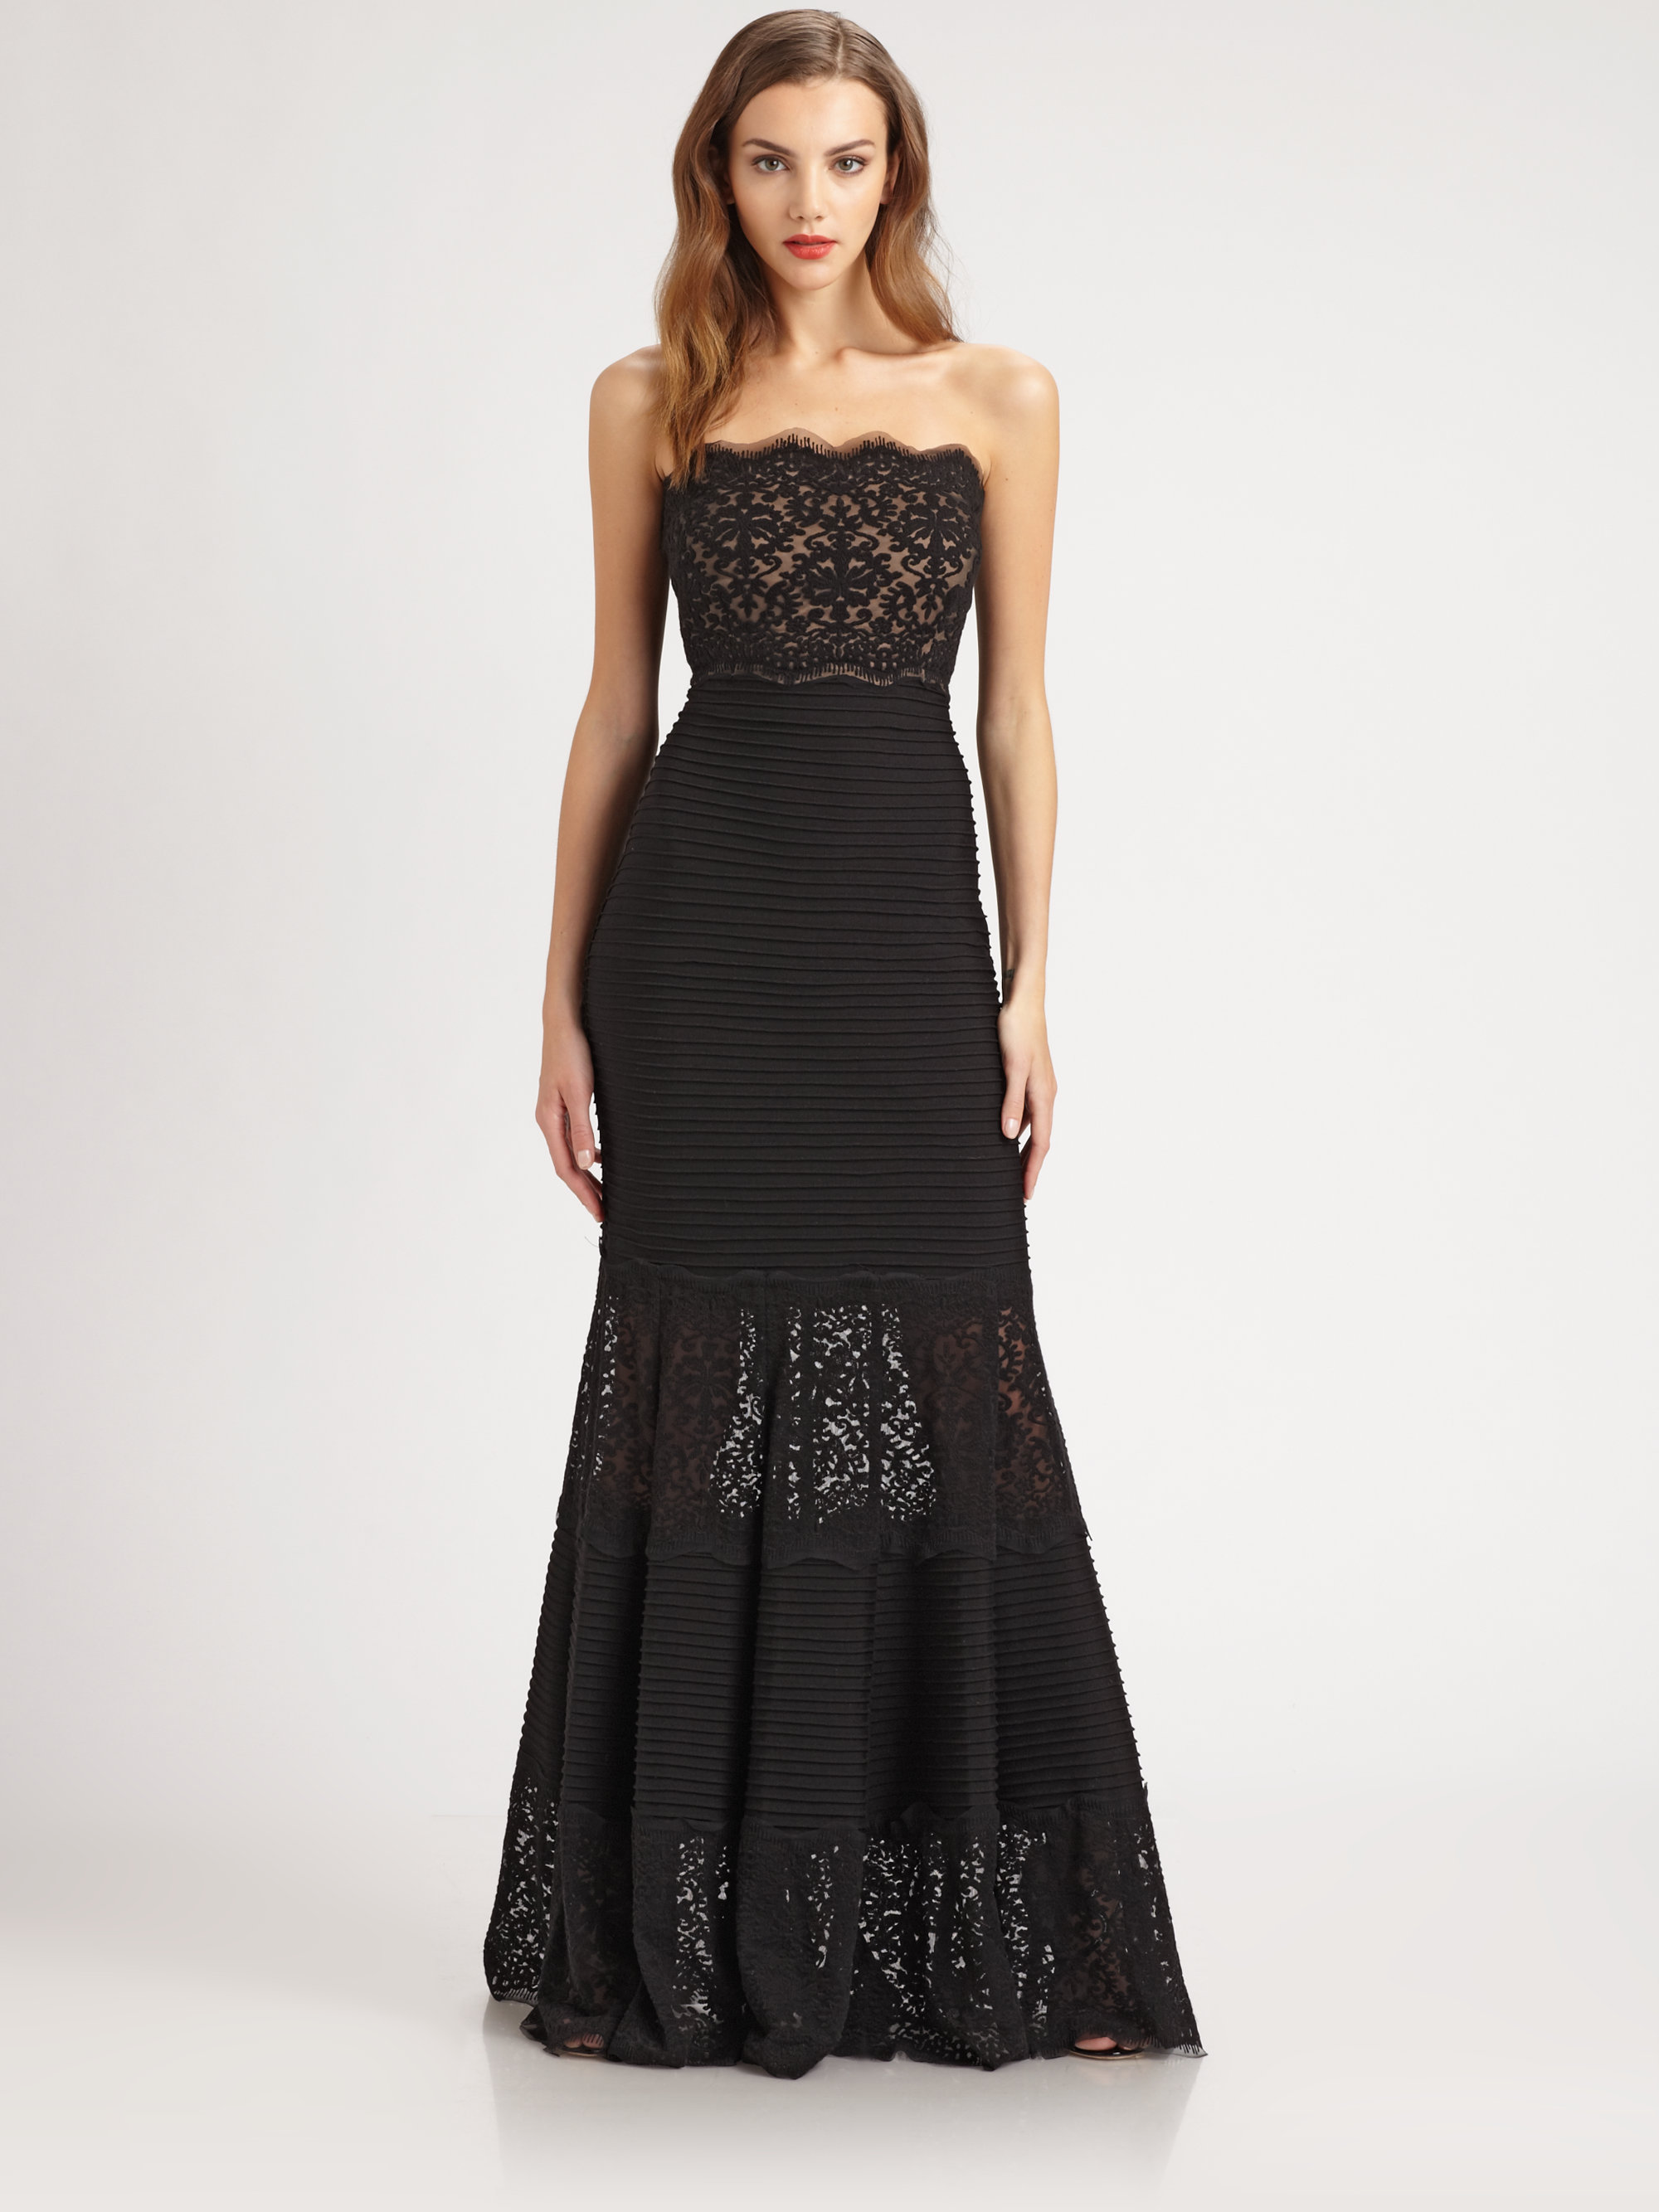 Tadashi Shoji Lace Illusion Dress – fashion dresses